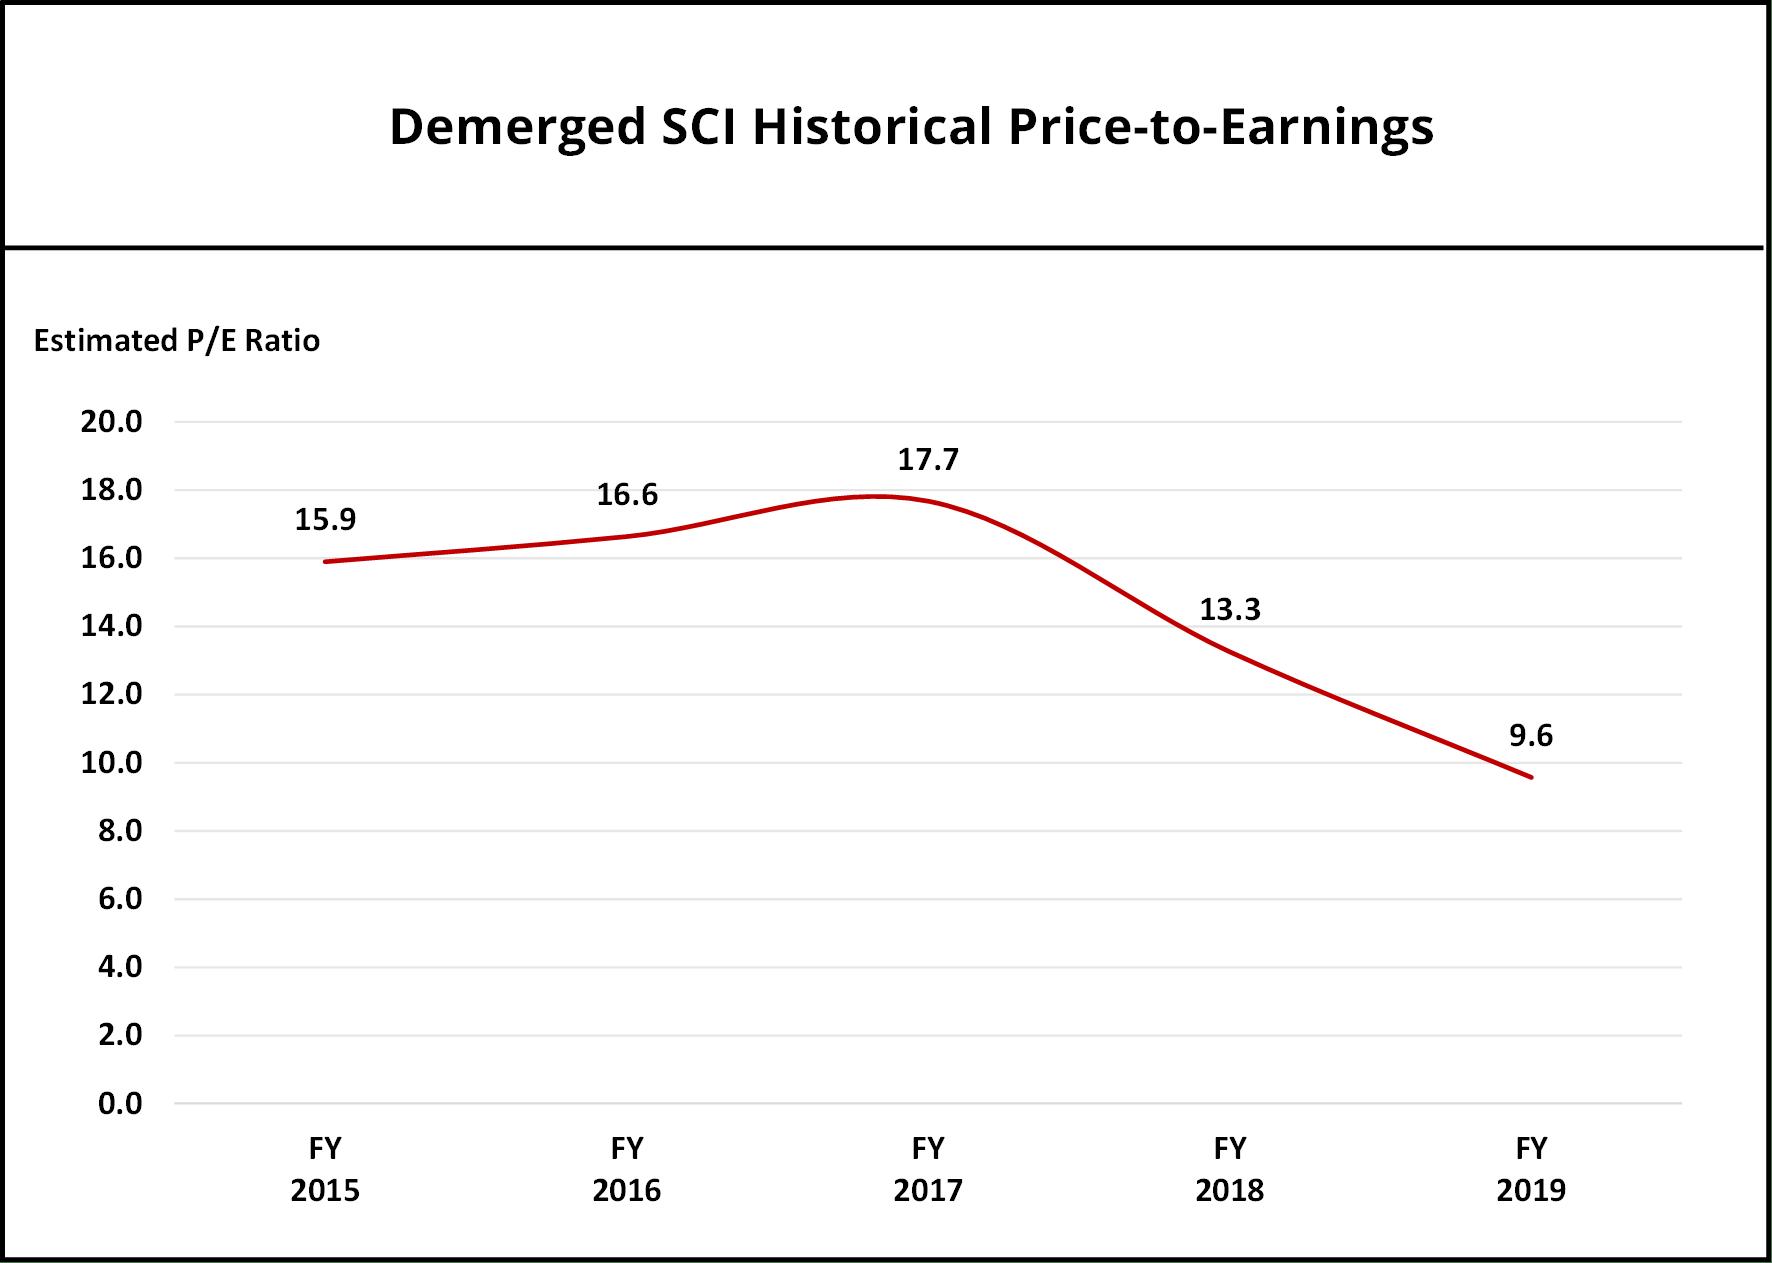 srcset=https://i2.wp.com/theinvestquest.com/wp-content/uploads/DSCI-Historical-PE-1.png?w=1772&ssl=1